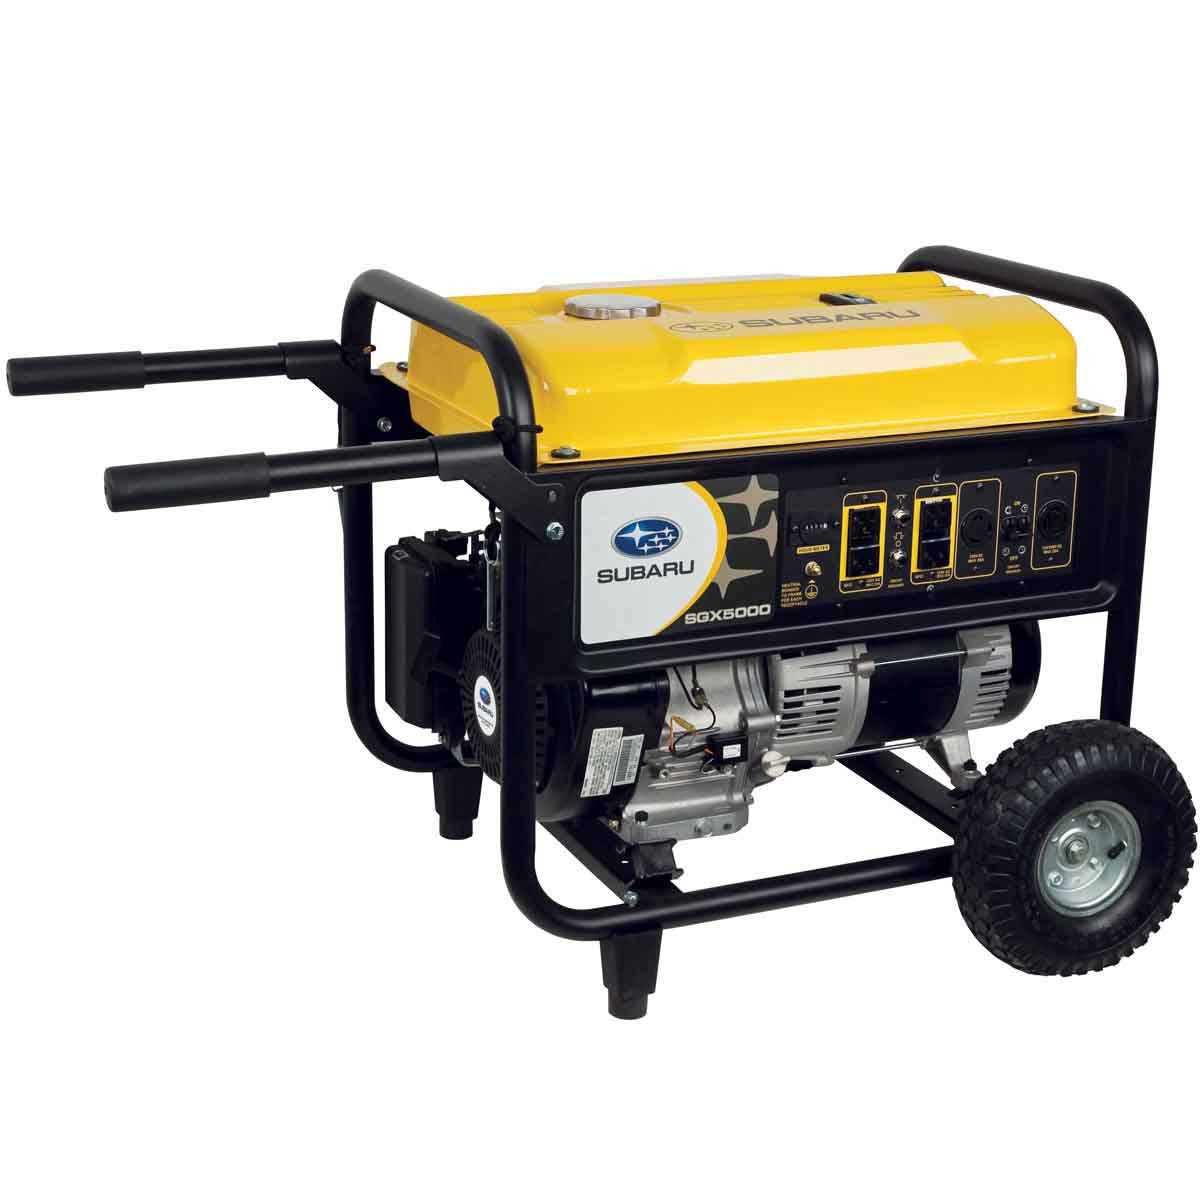 Subaru Commercial Portable Generator 4,900 Watt